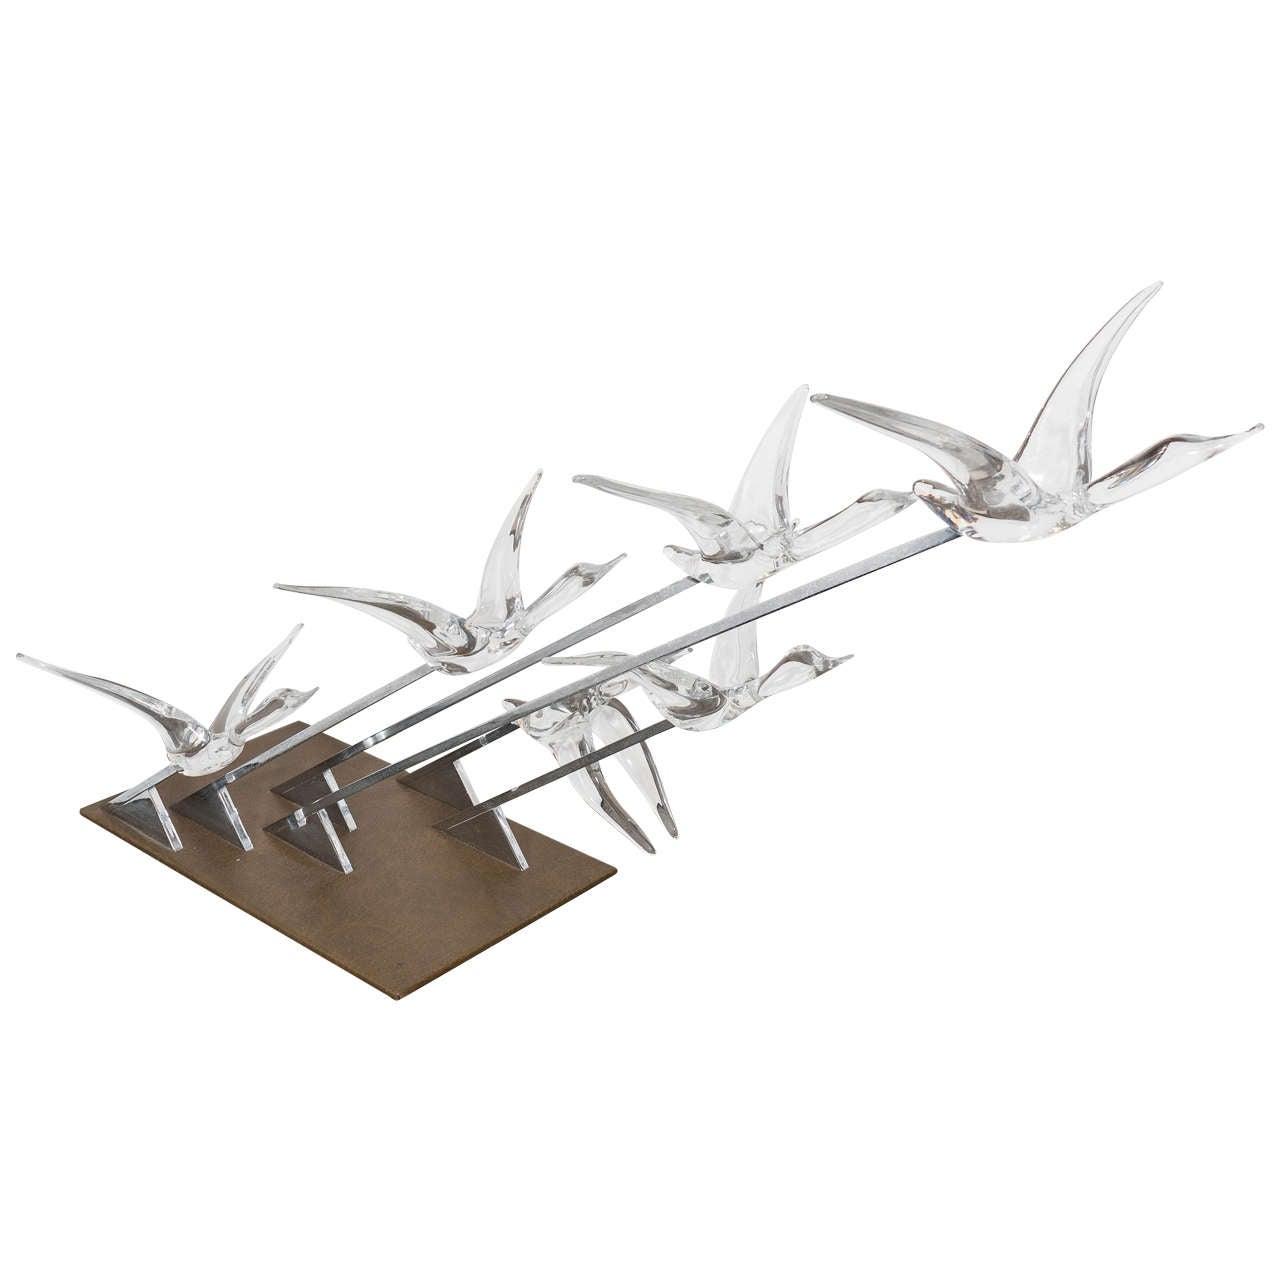 Daum Sculpture of Glass Geese in Flight